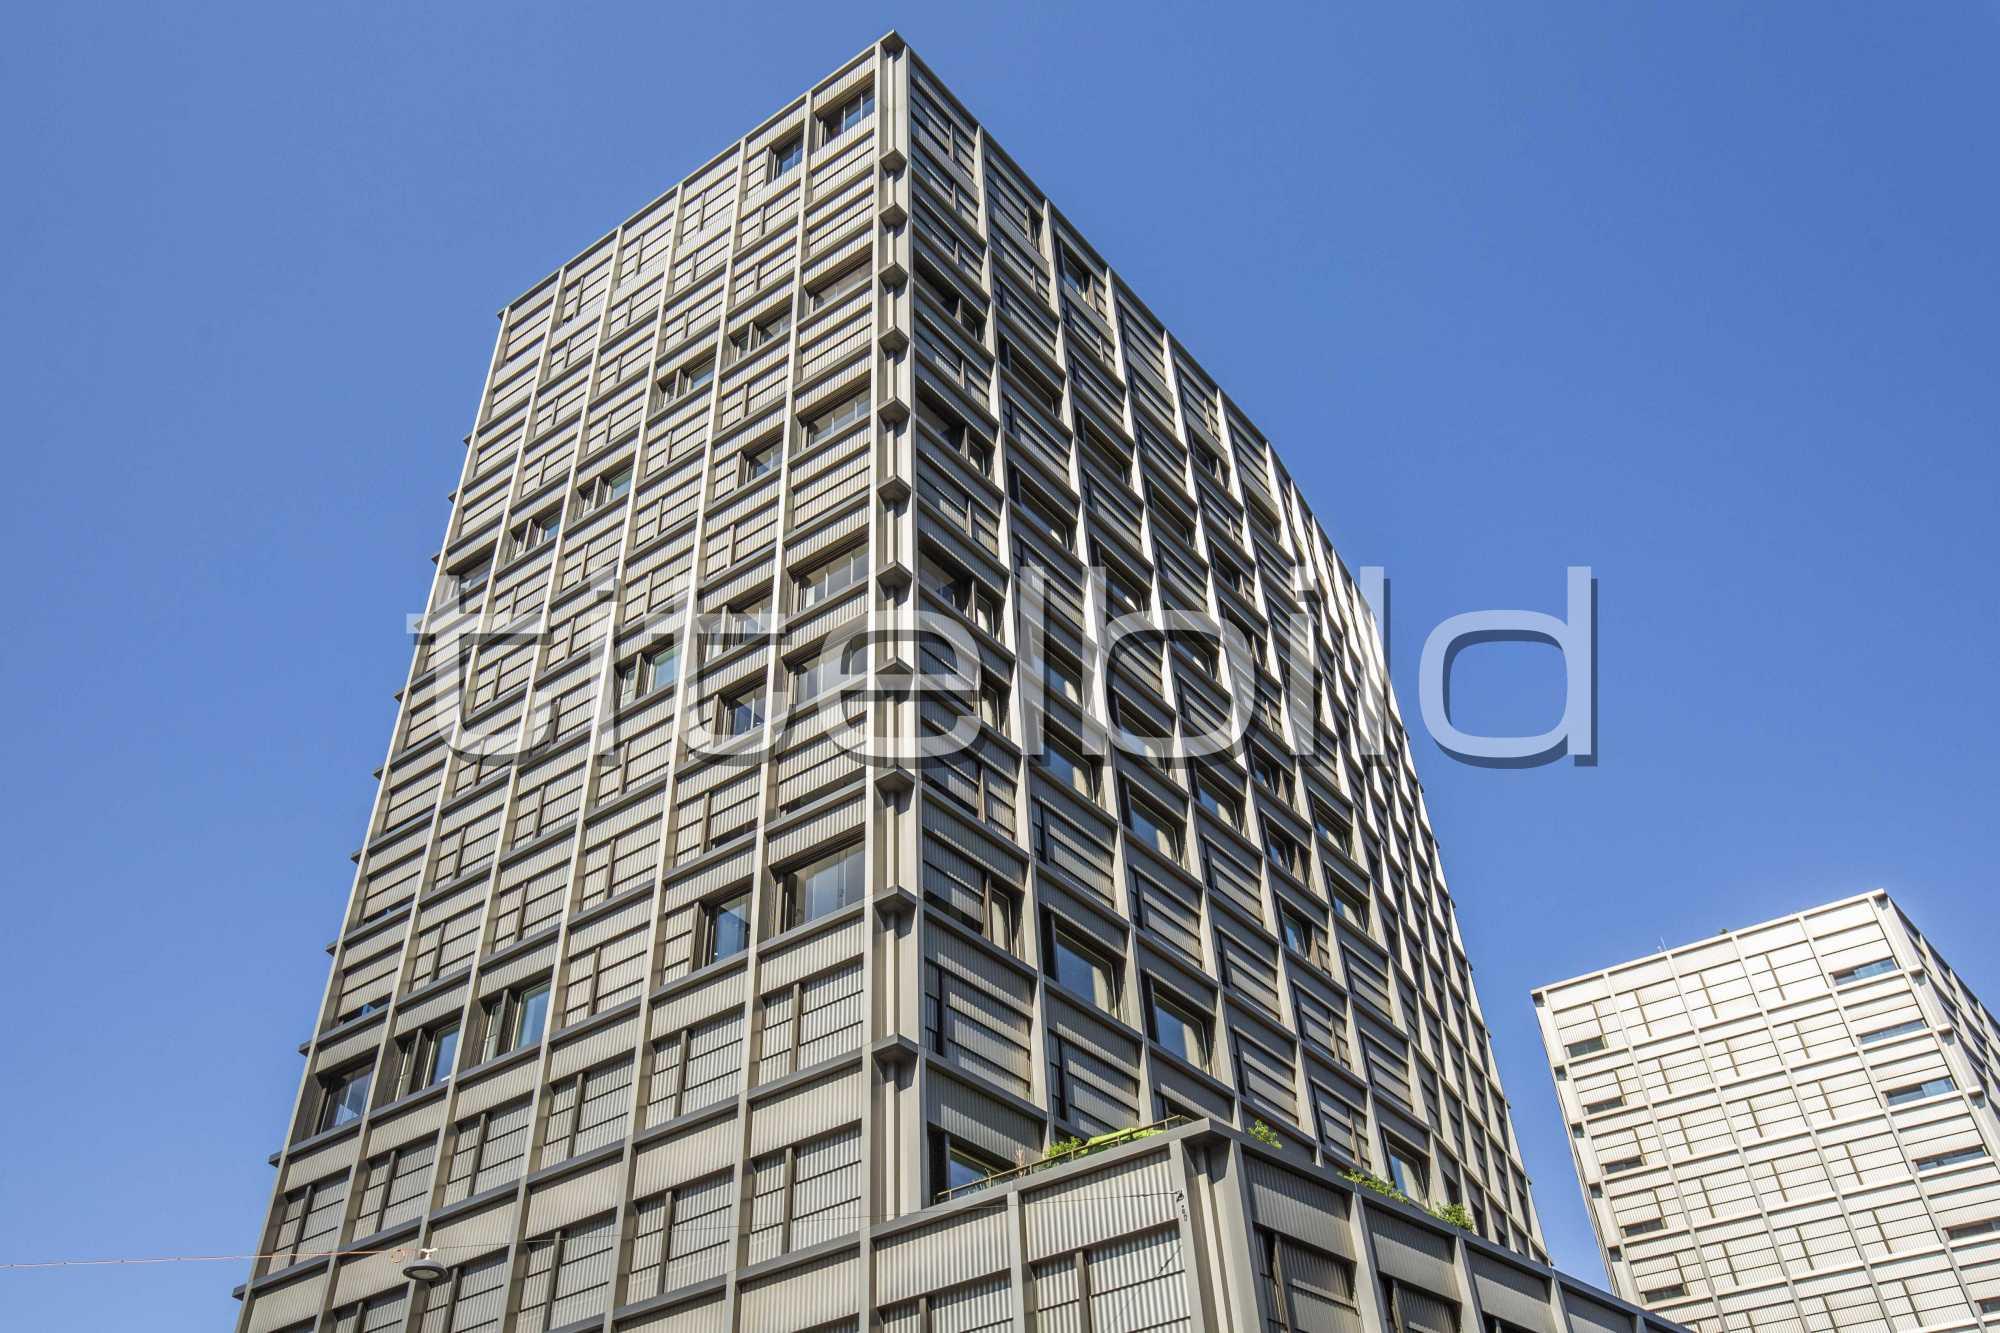 Projektbild-Nr. 8: Europaallee Baufeld G